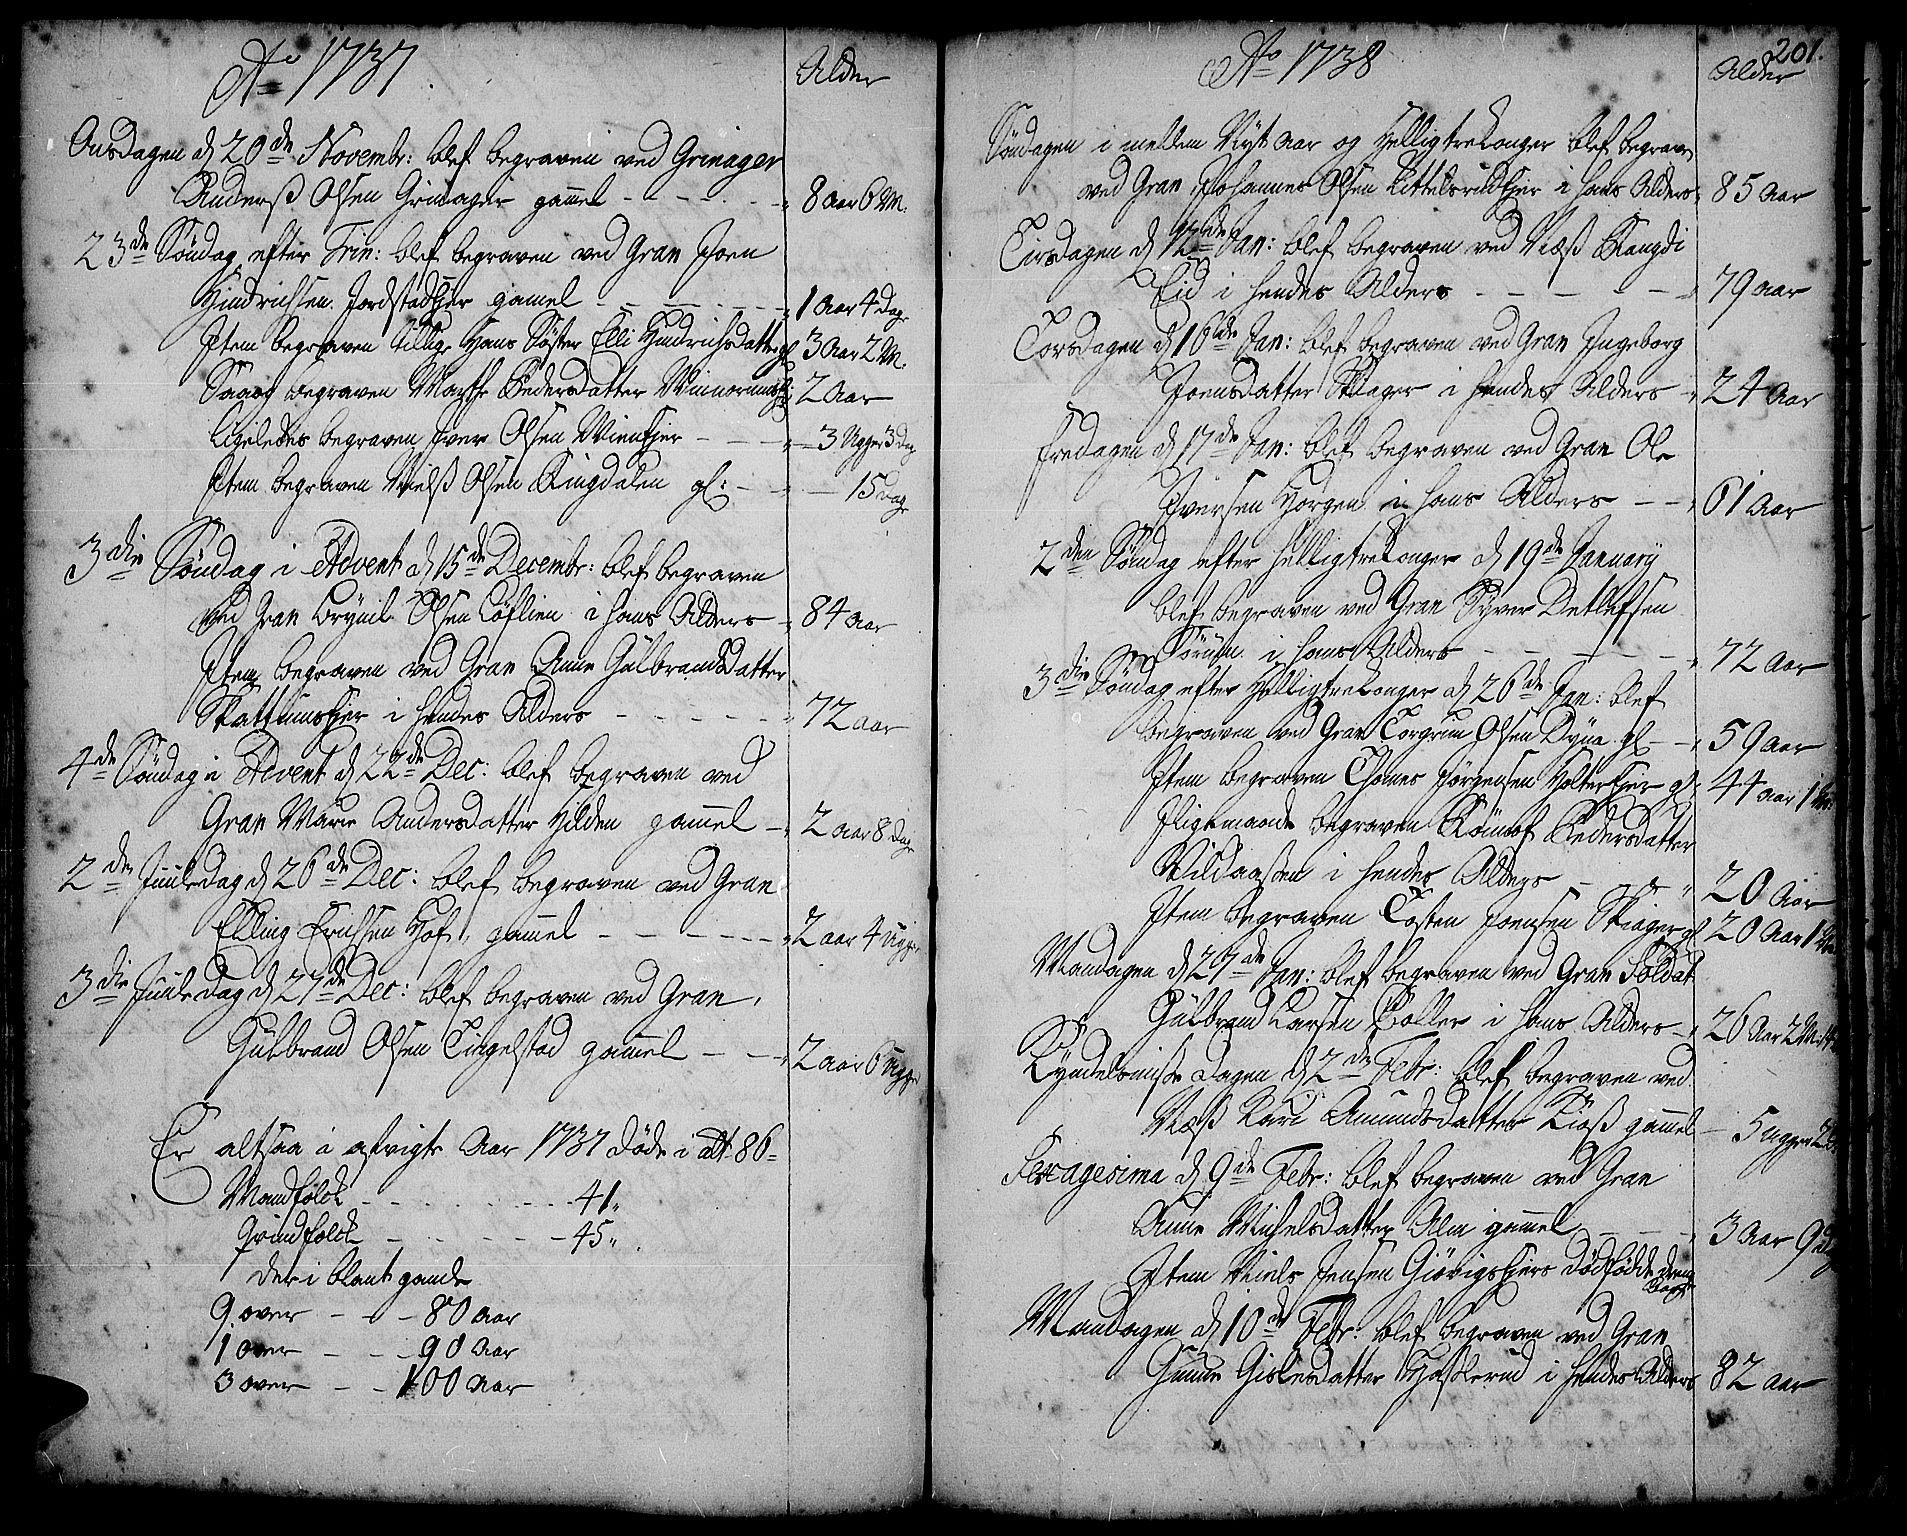 SAH, Gran prestekontor, Ministerialbok nr. 2, 1732-1744, s. 201